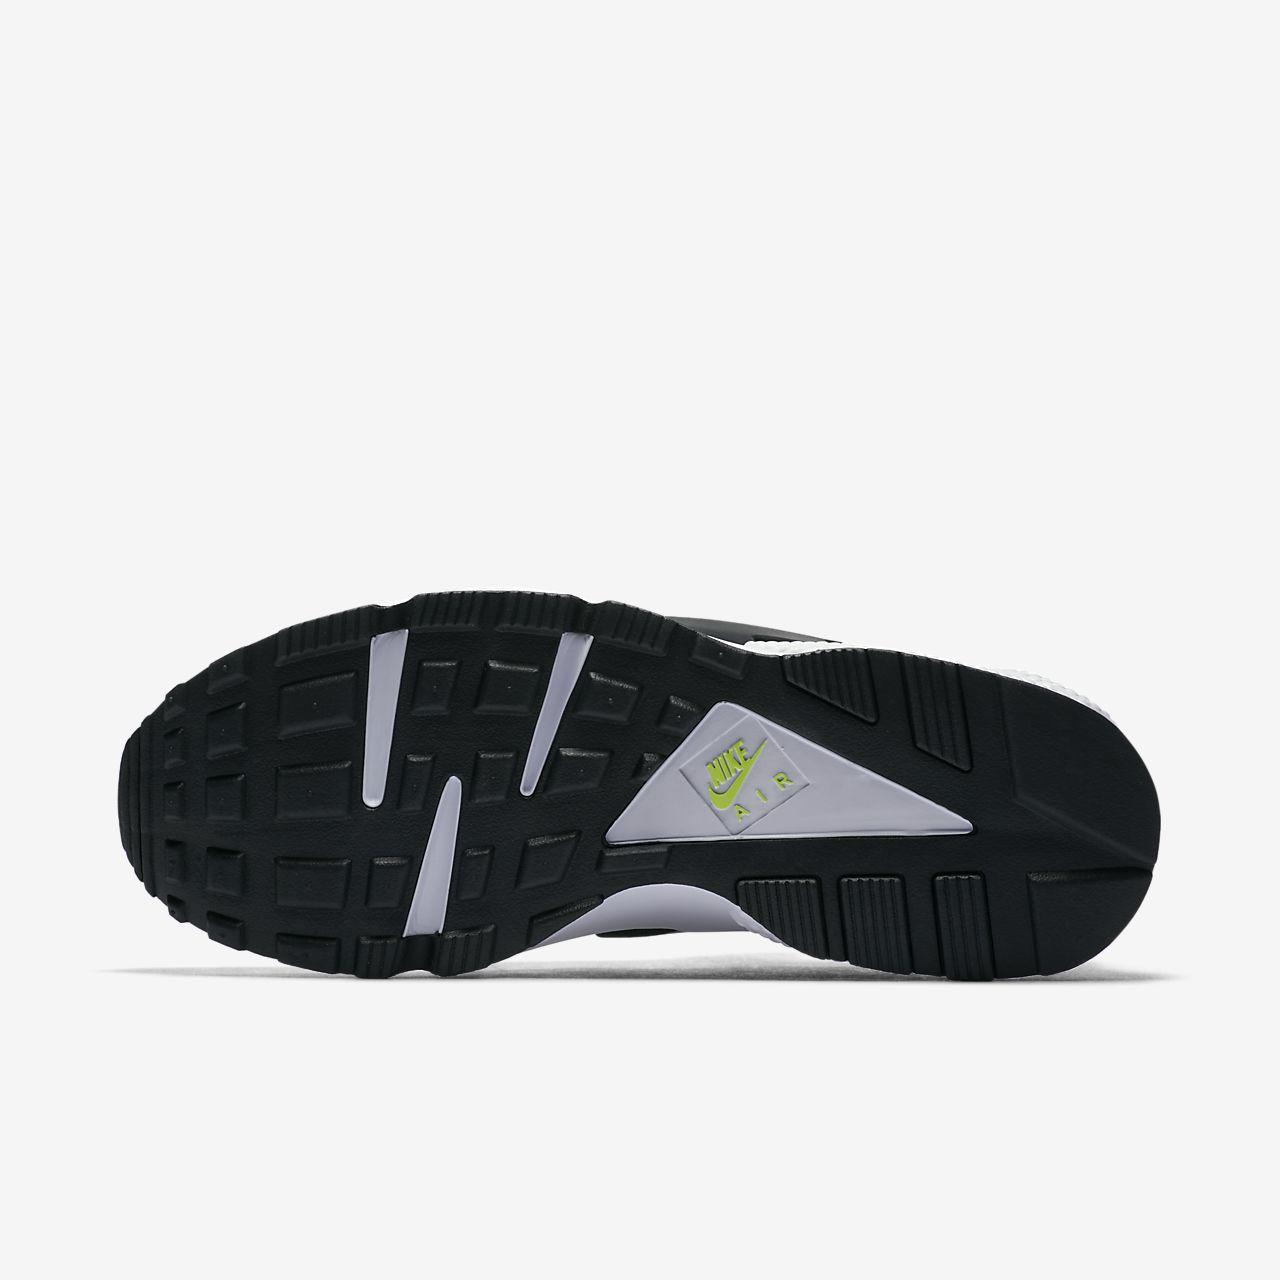 reputable site 10adb 59cbb ... Calzado para hombre Nike Air Huarache  91 QS